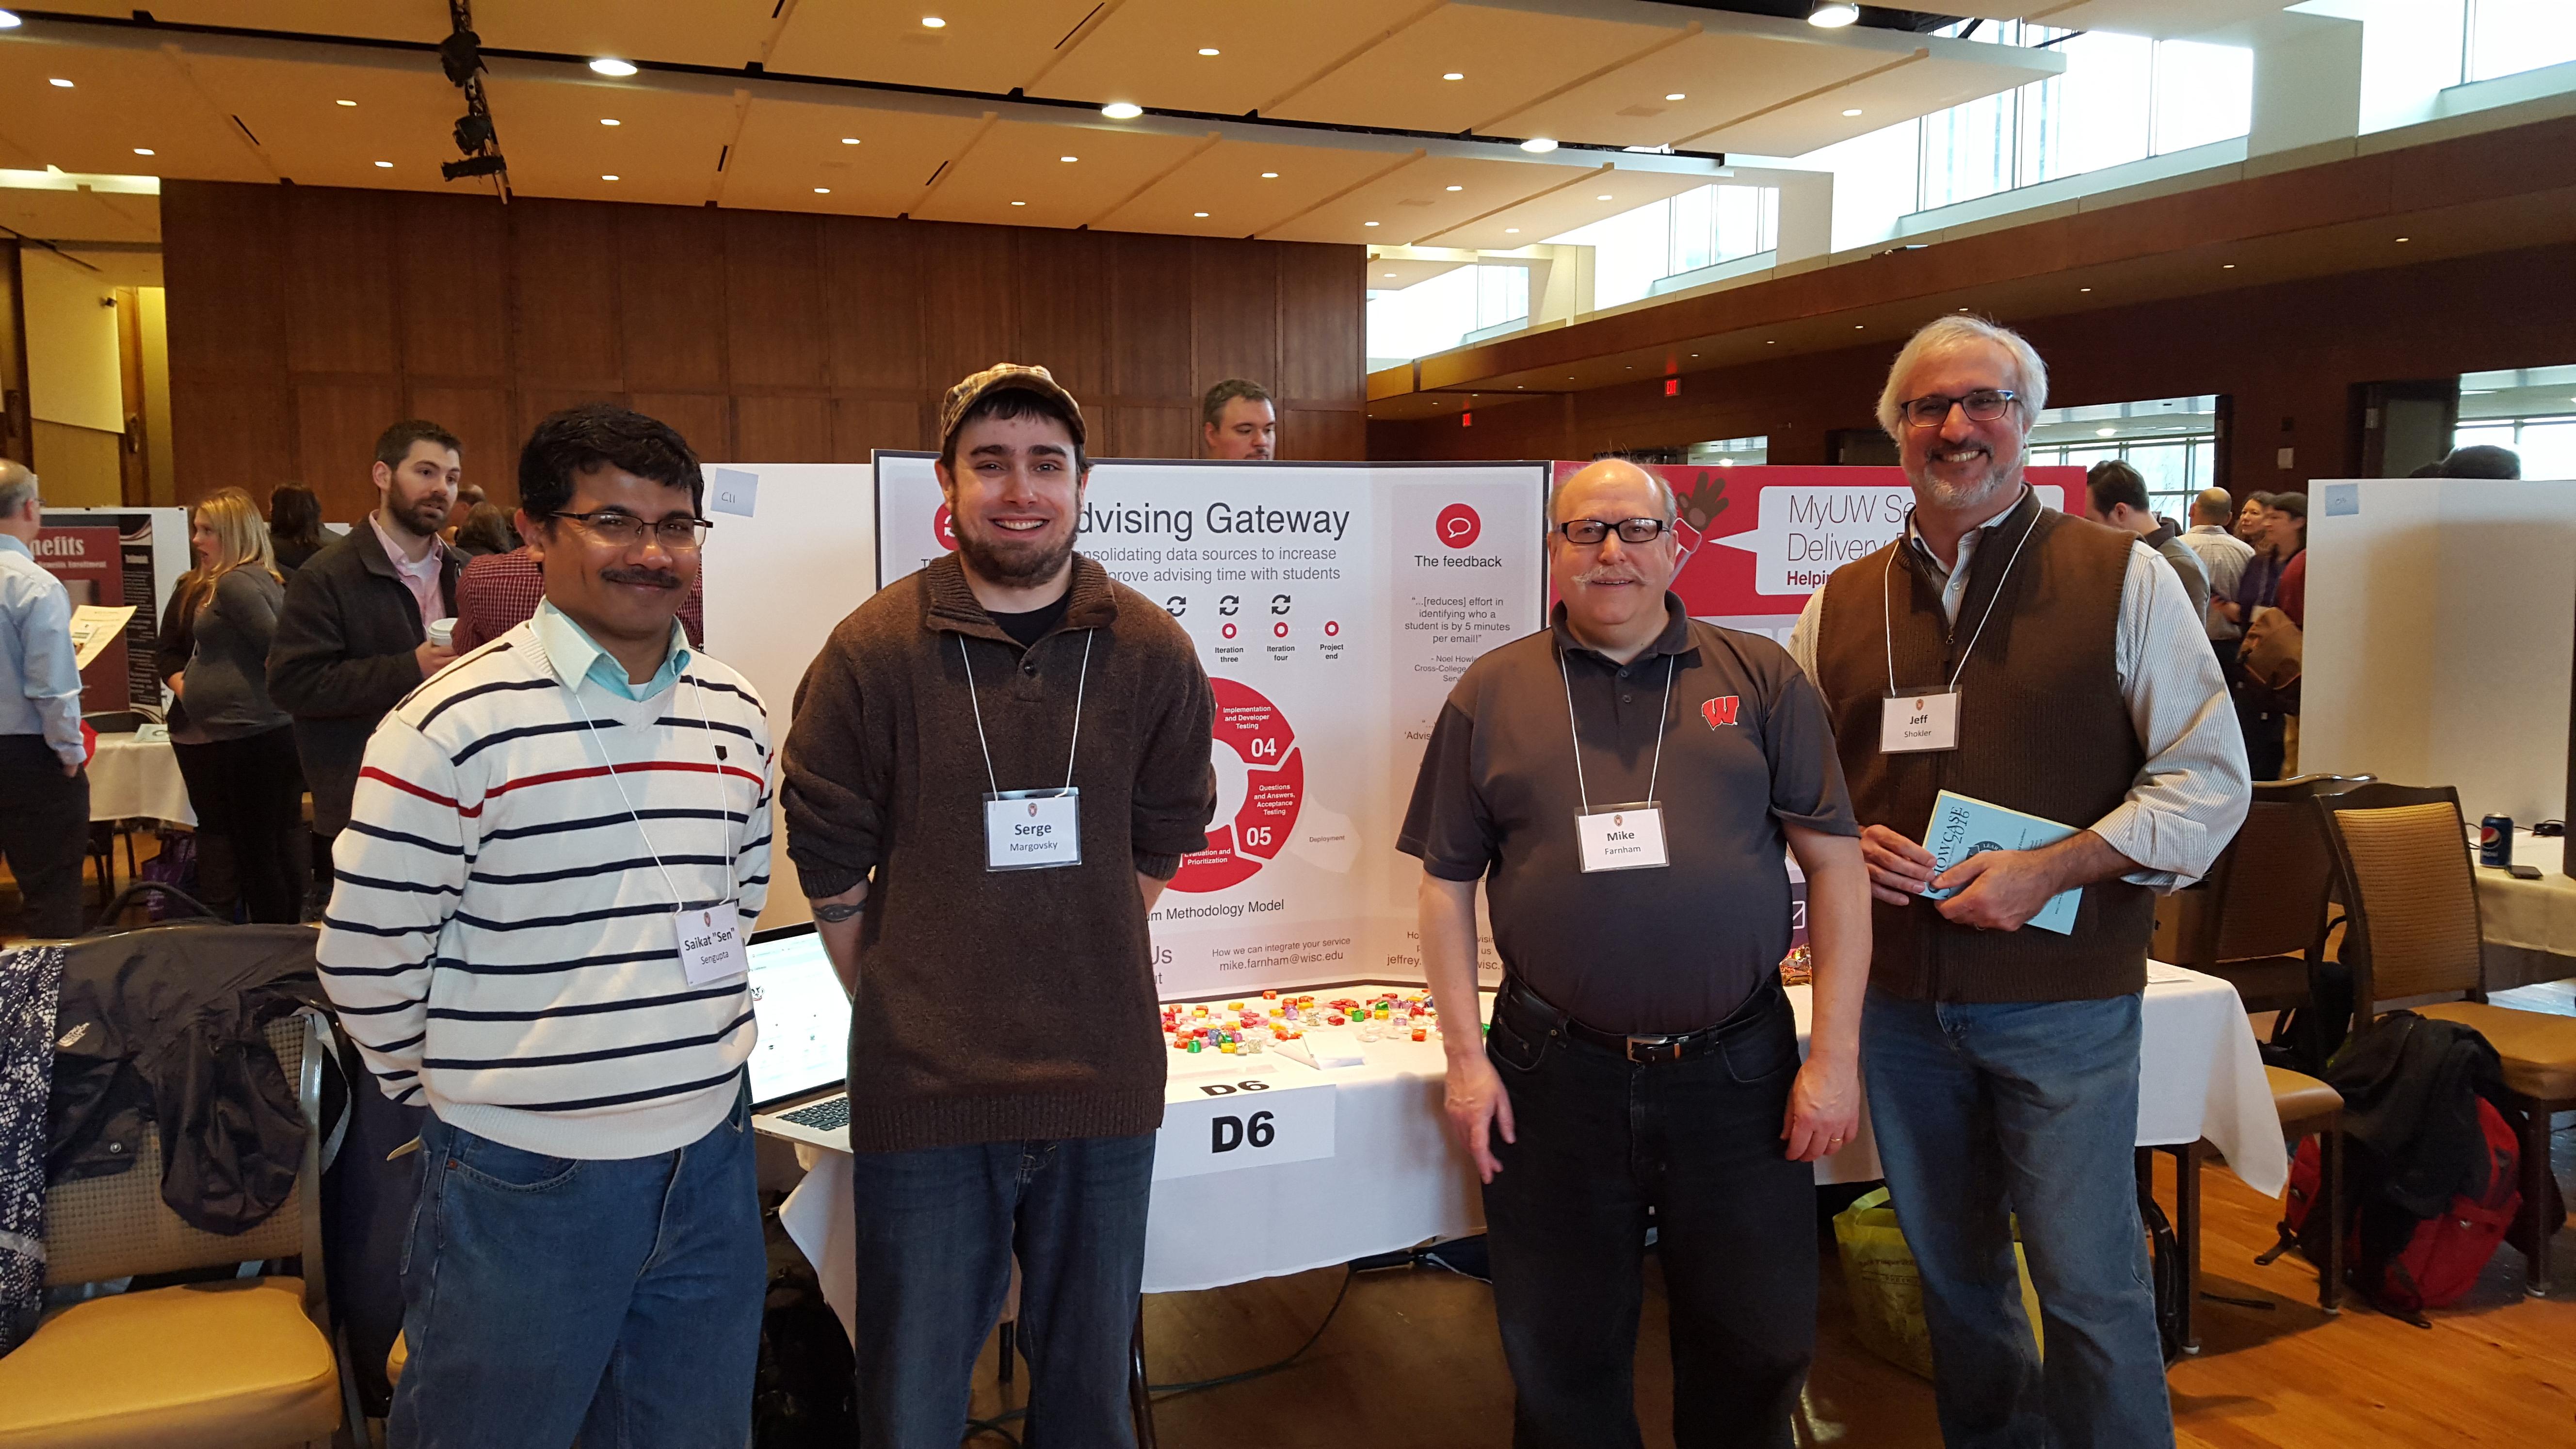 Saikat Sengupta, Serge Margovsky, Mike Farnham and Jeff Shokler at MUMAA's Advising Gateway poster